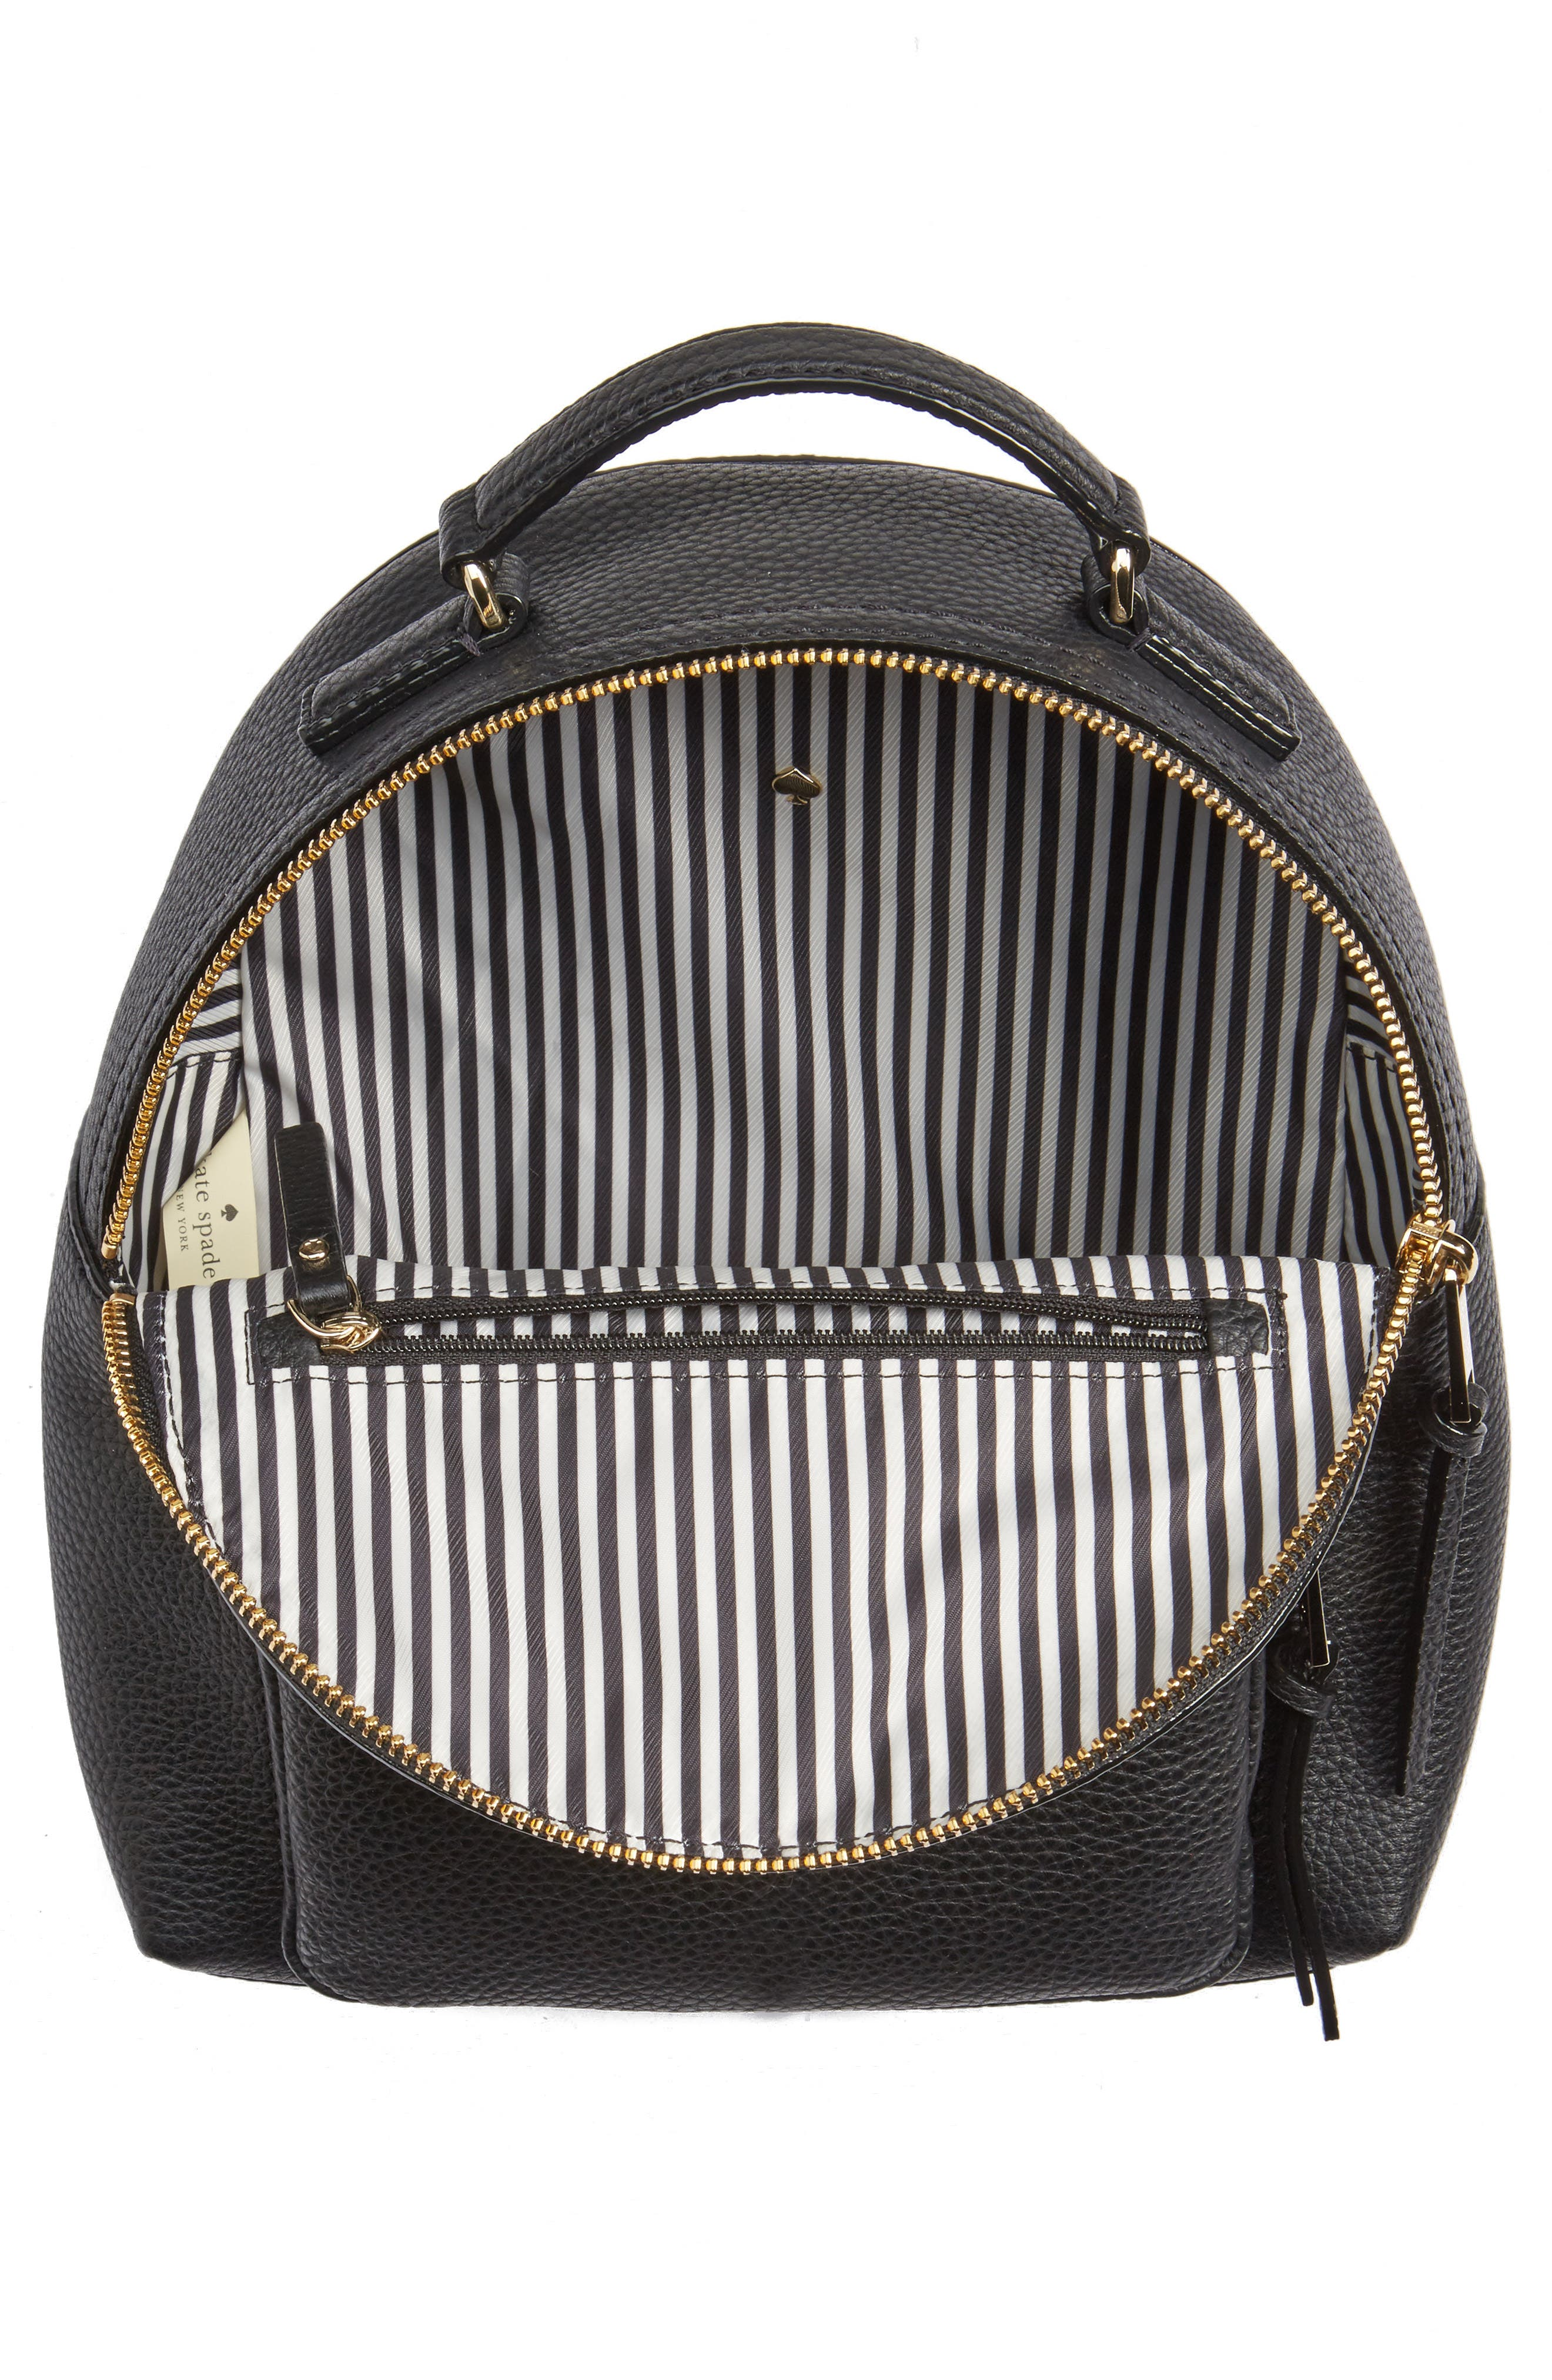 KATE SPADE NEW YORK,                             jackson street - keleigh leather backpack,                             Alternate thumbnail 4, color,                             BLACK